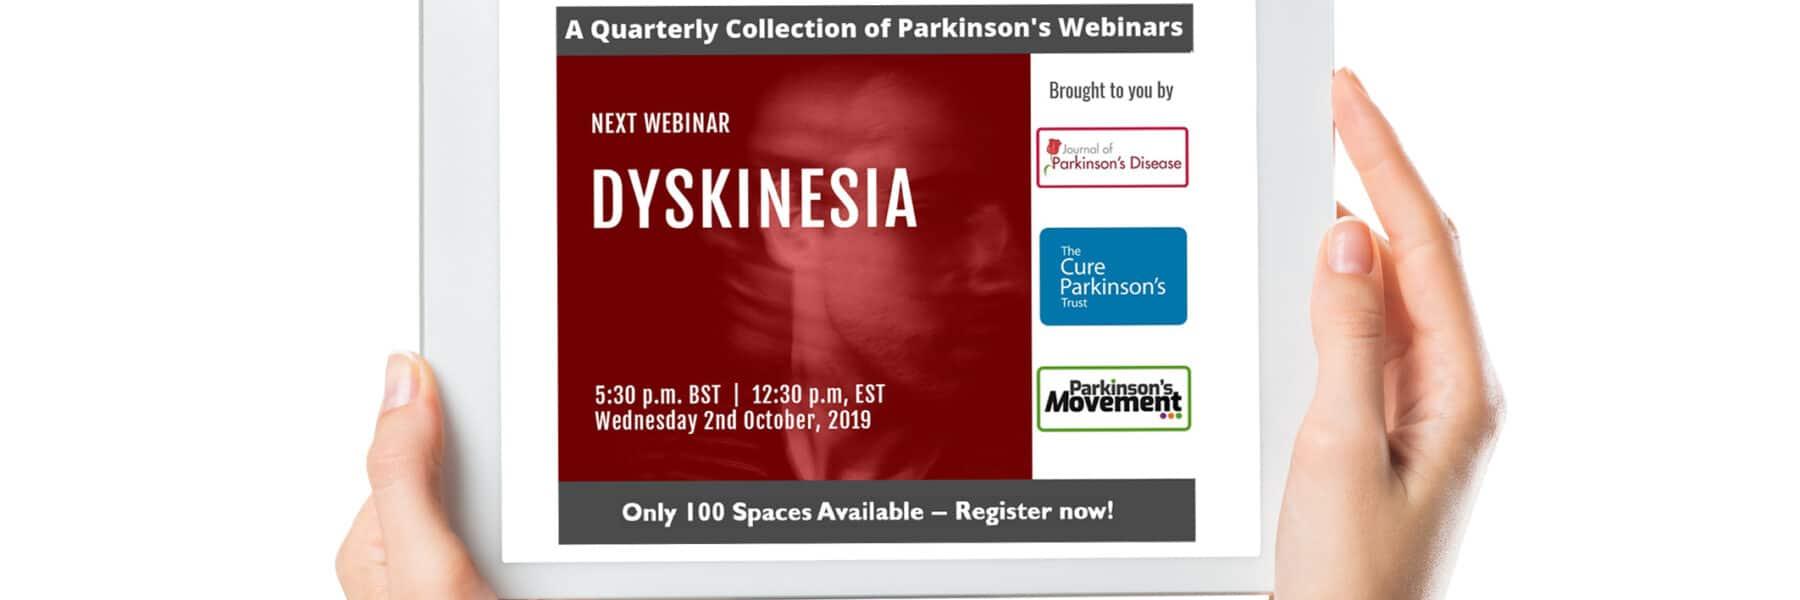 Dyskinesia webinar